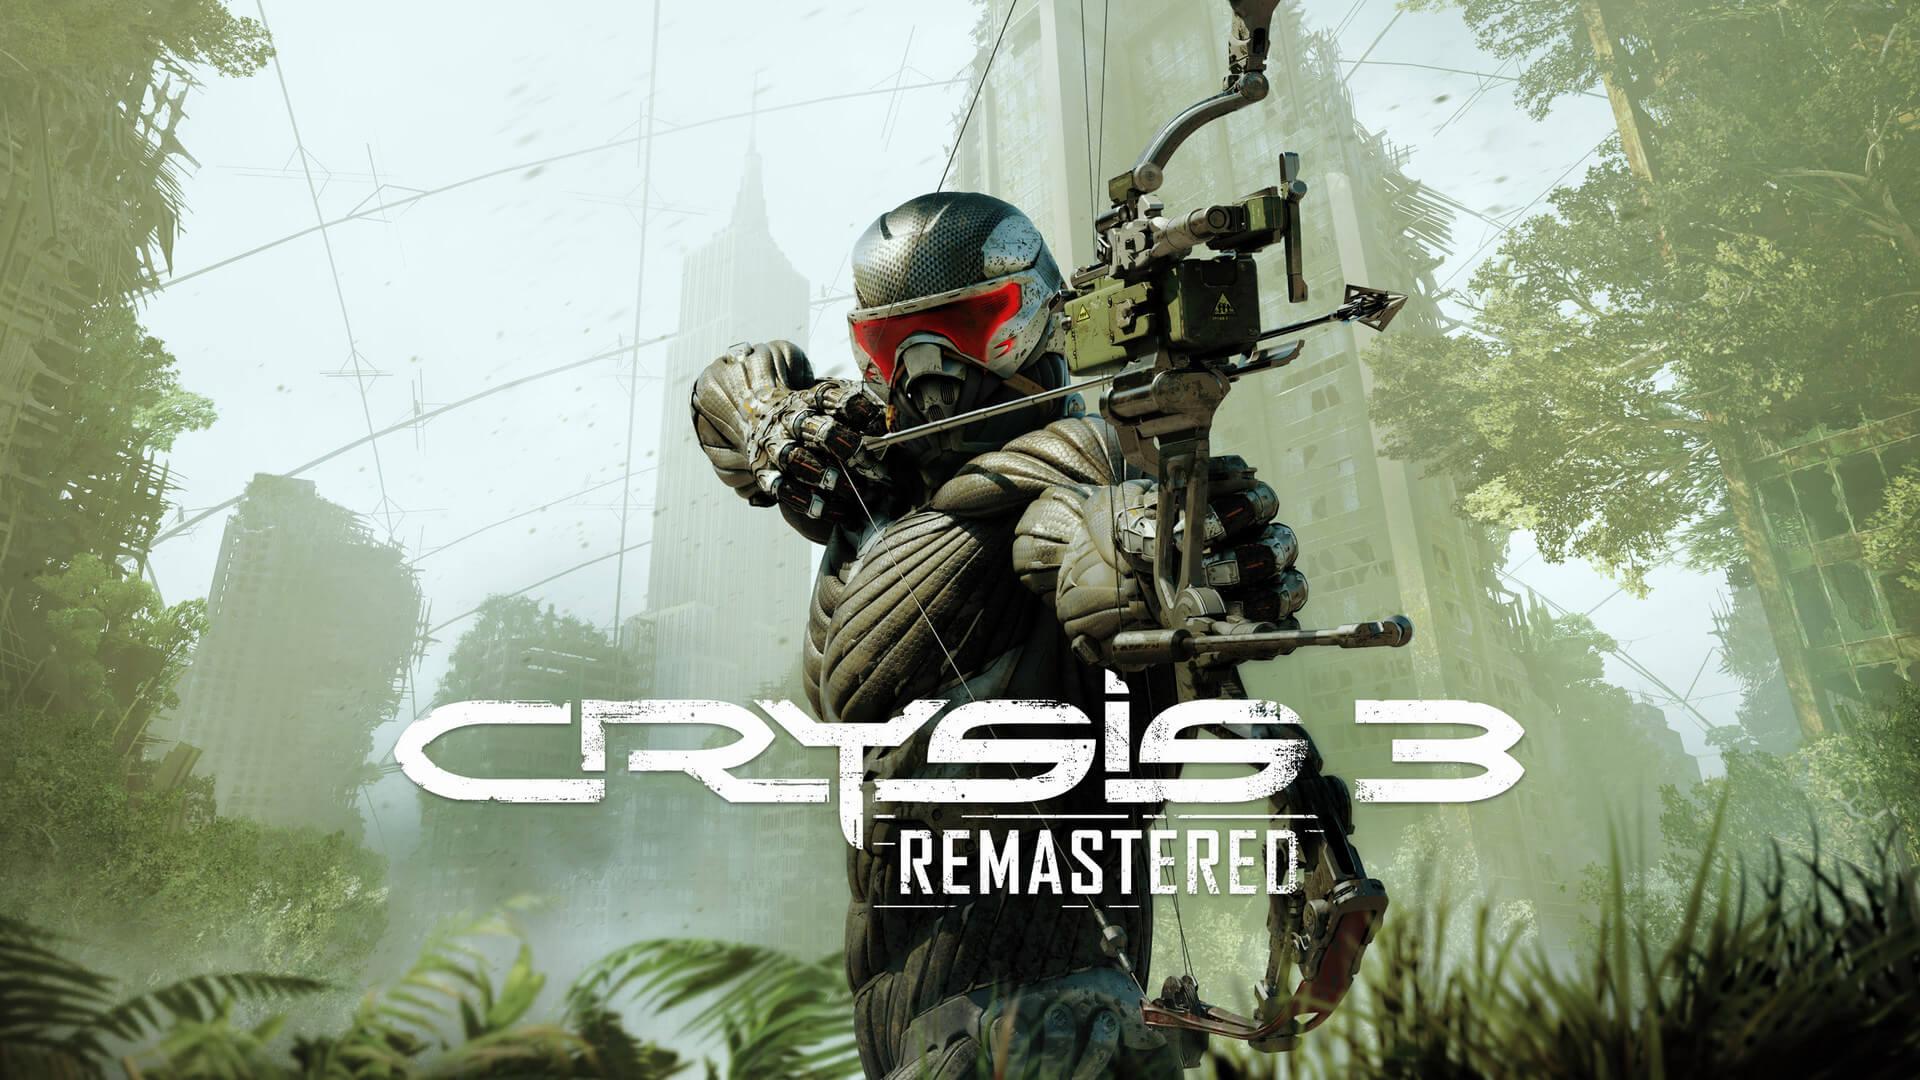 Crysis 3 Remastered PC Performance Analysis - DSOGaming